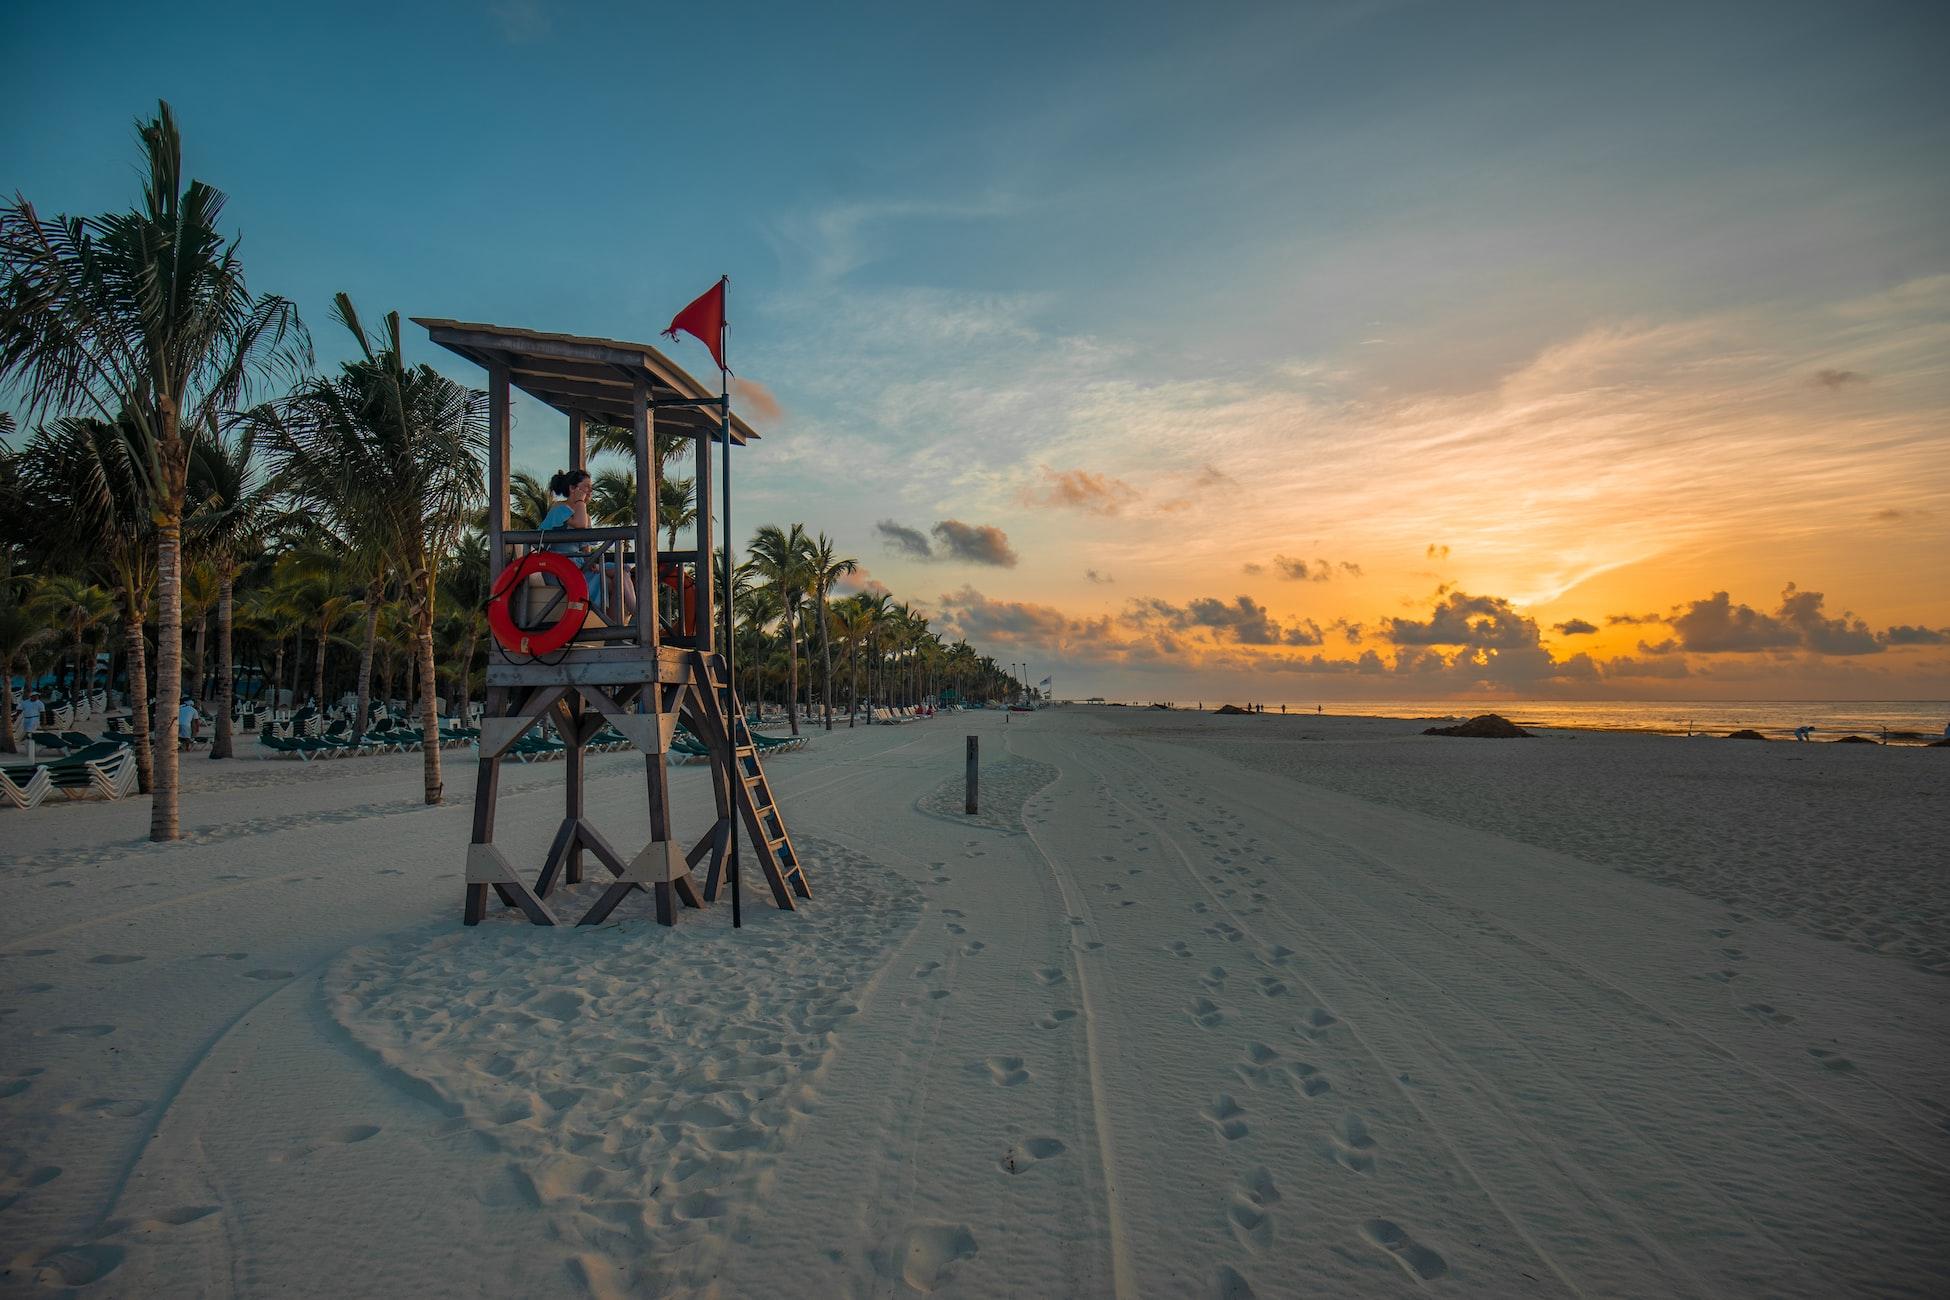 lifeguard tower on the beach in playa del carmen